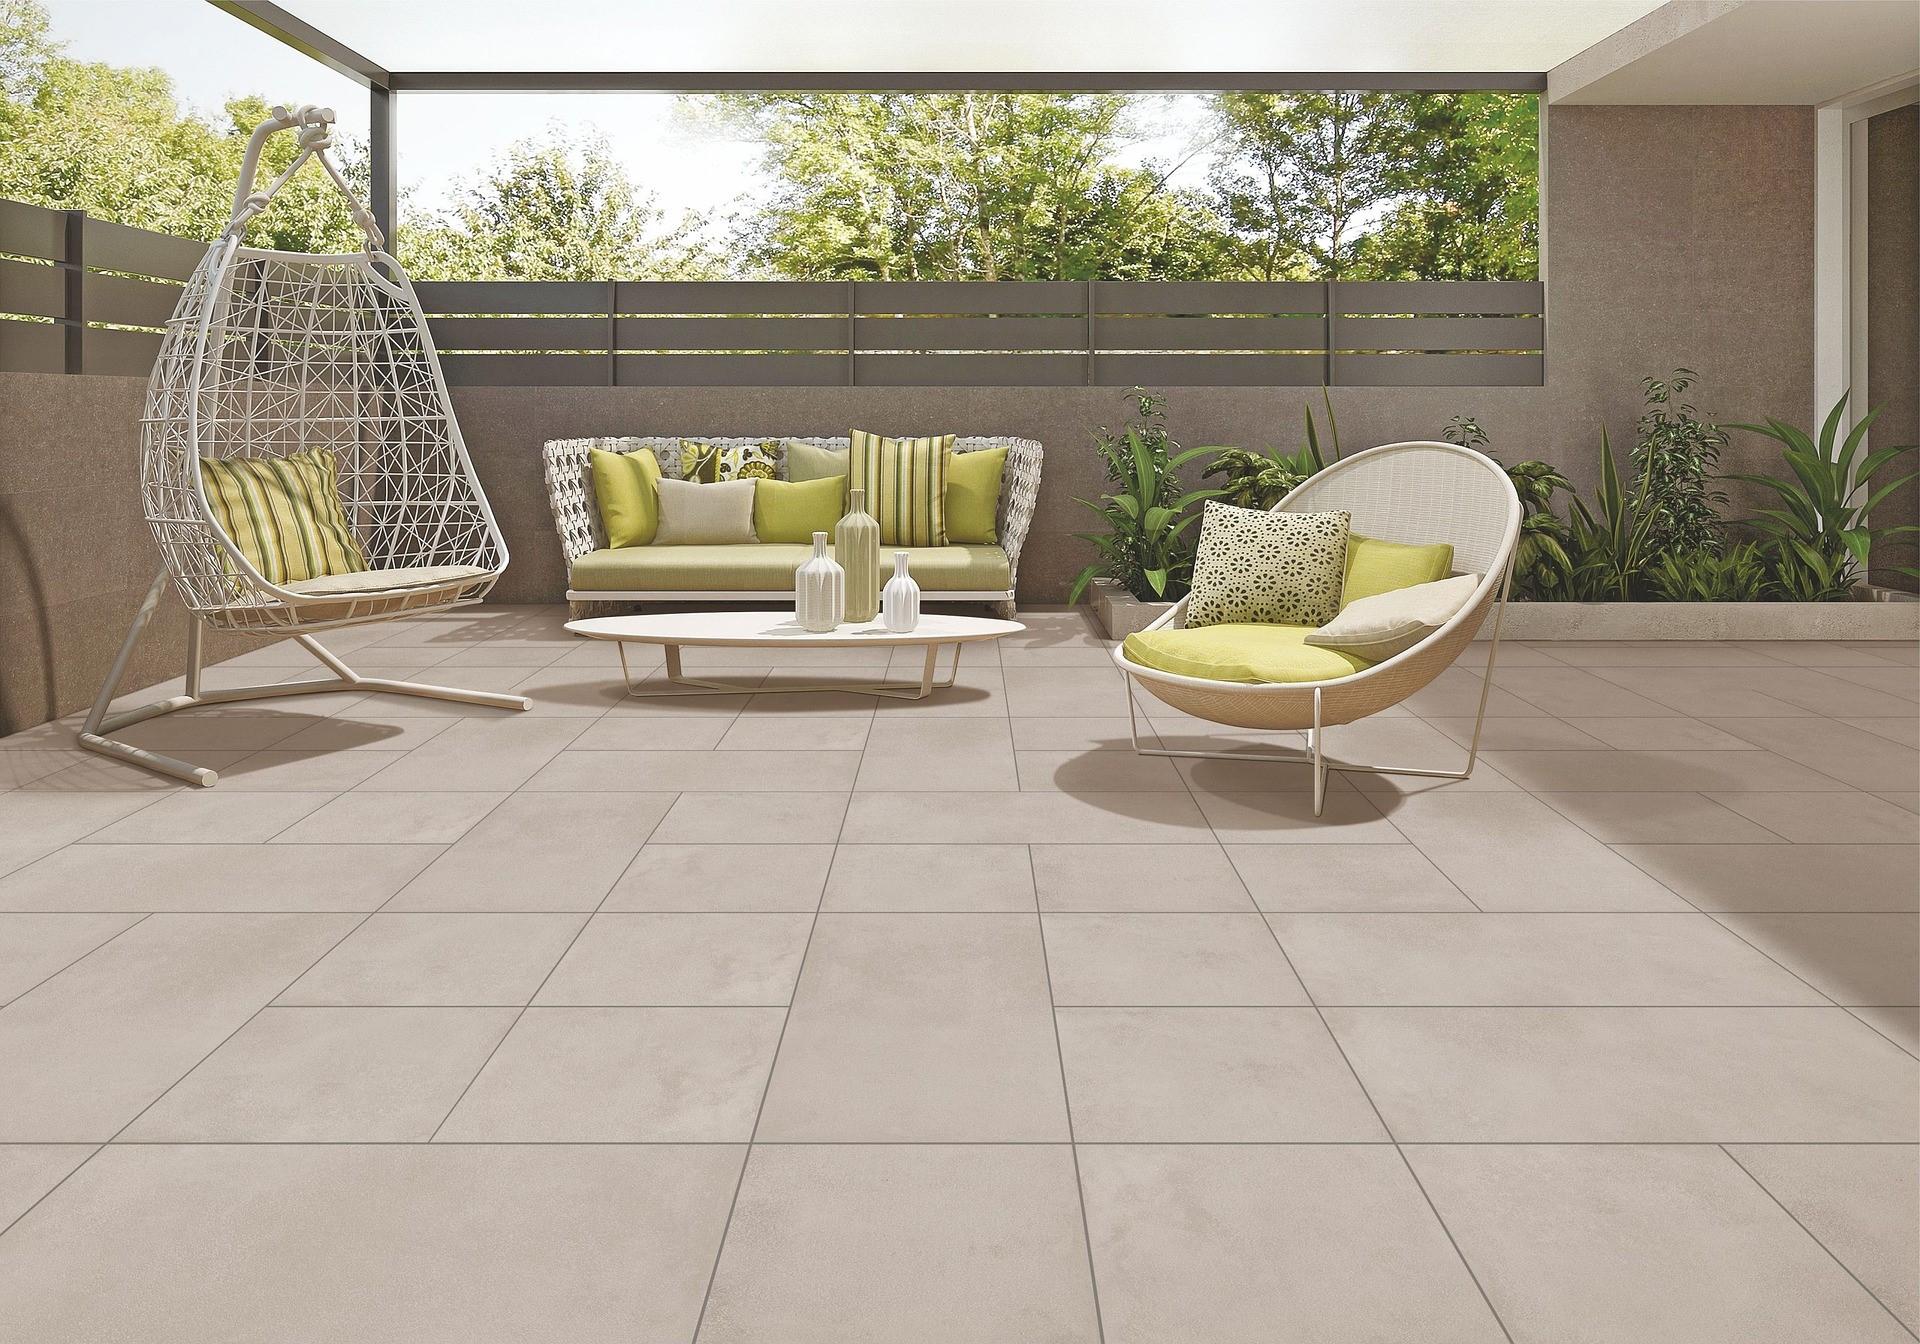 Betonnen terrasvloer zelf maken